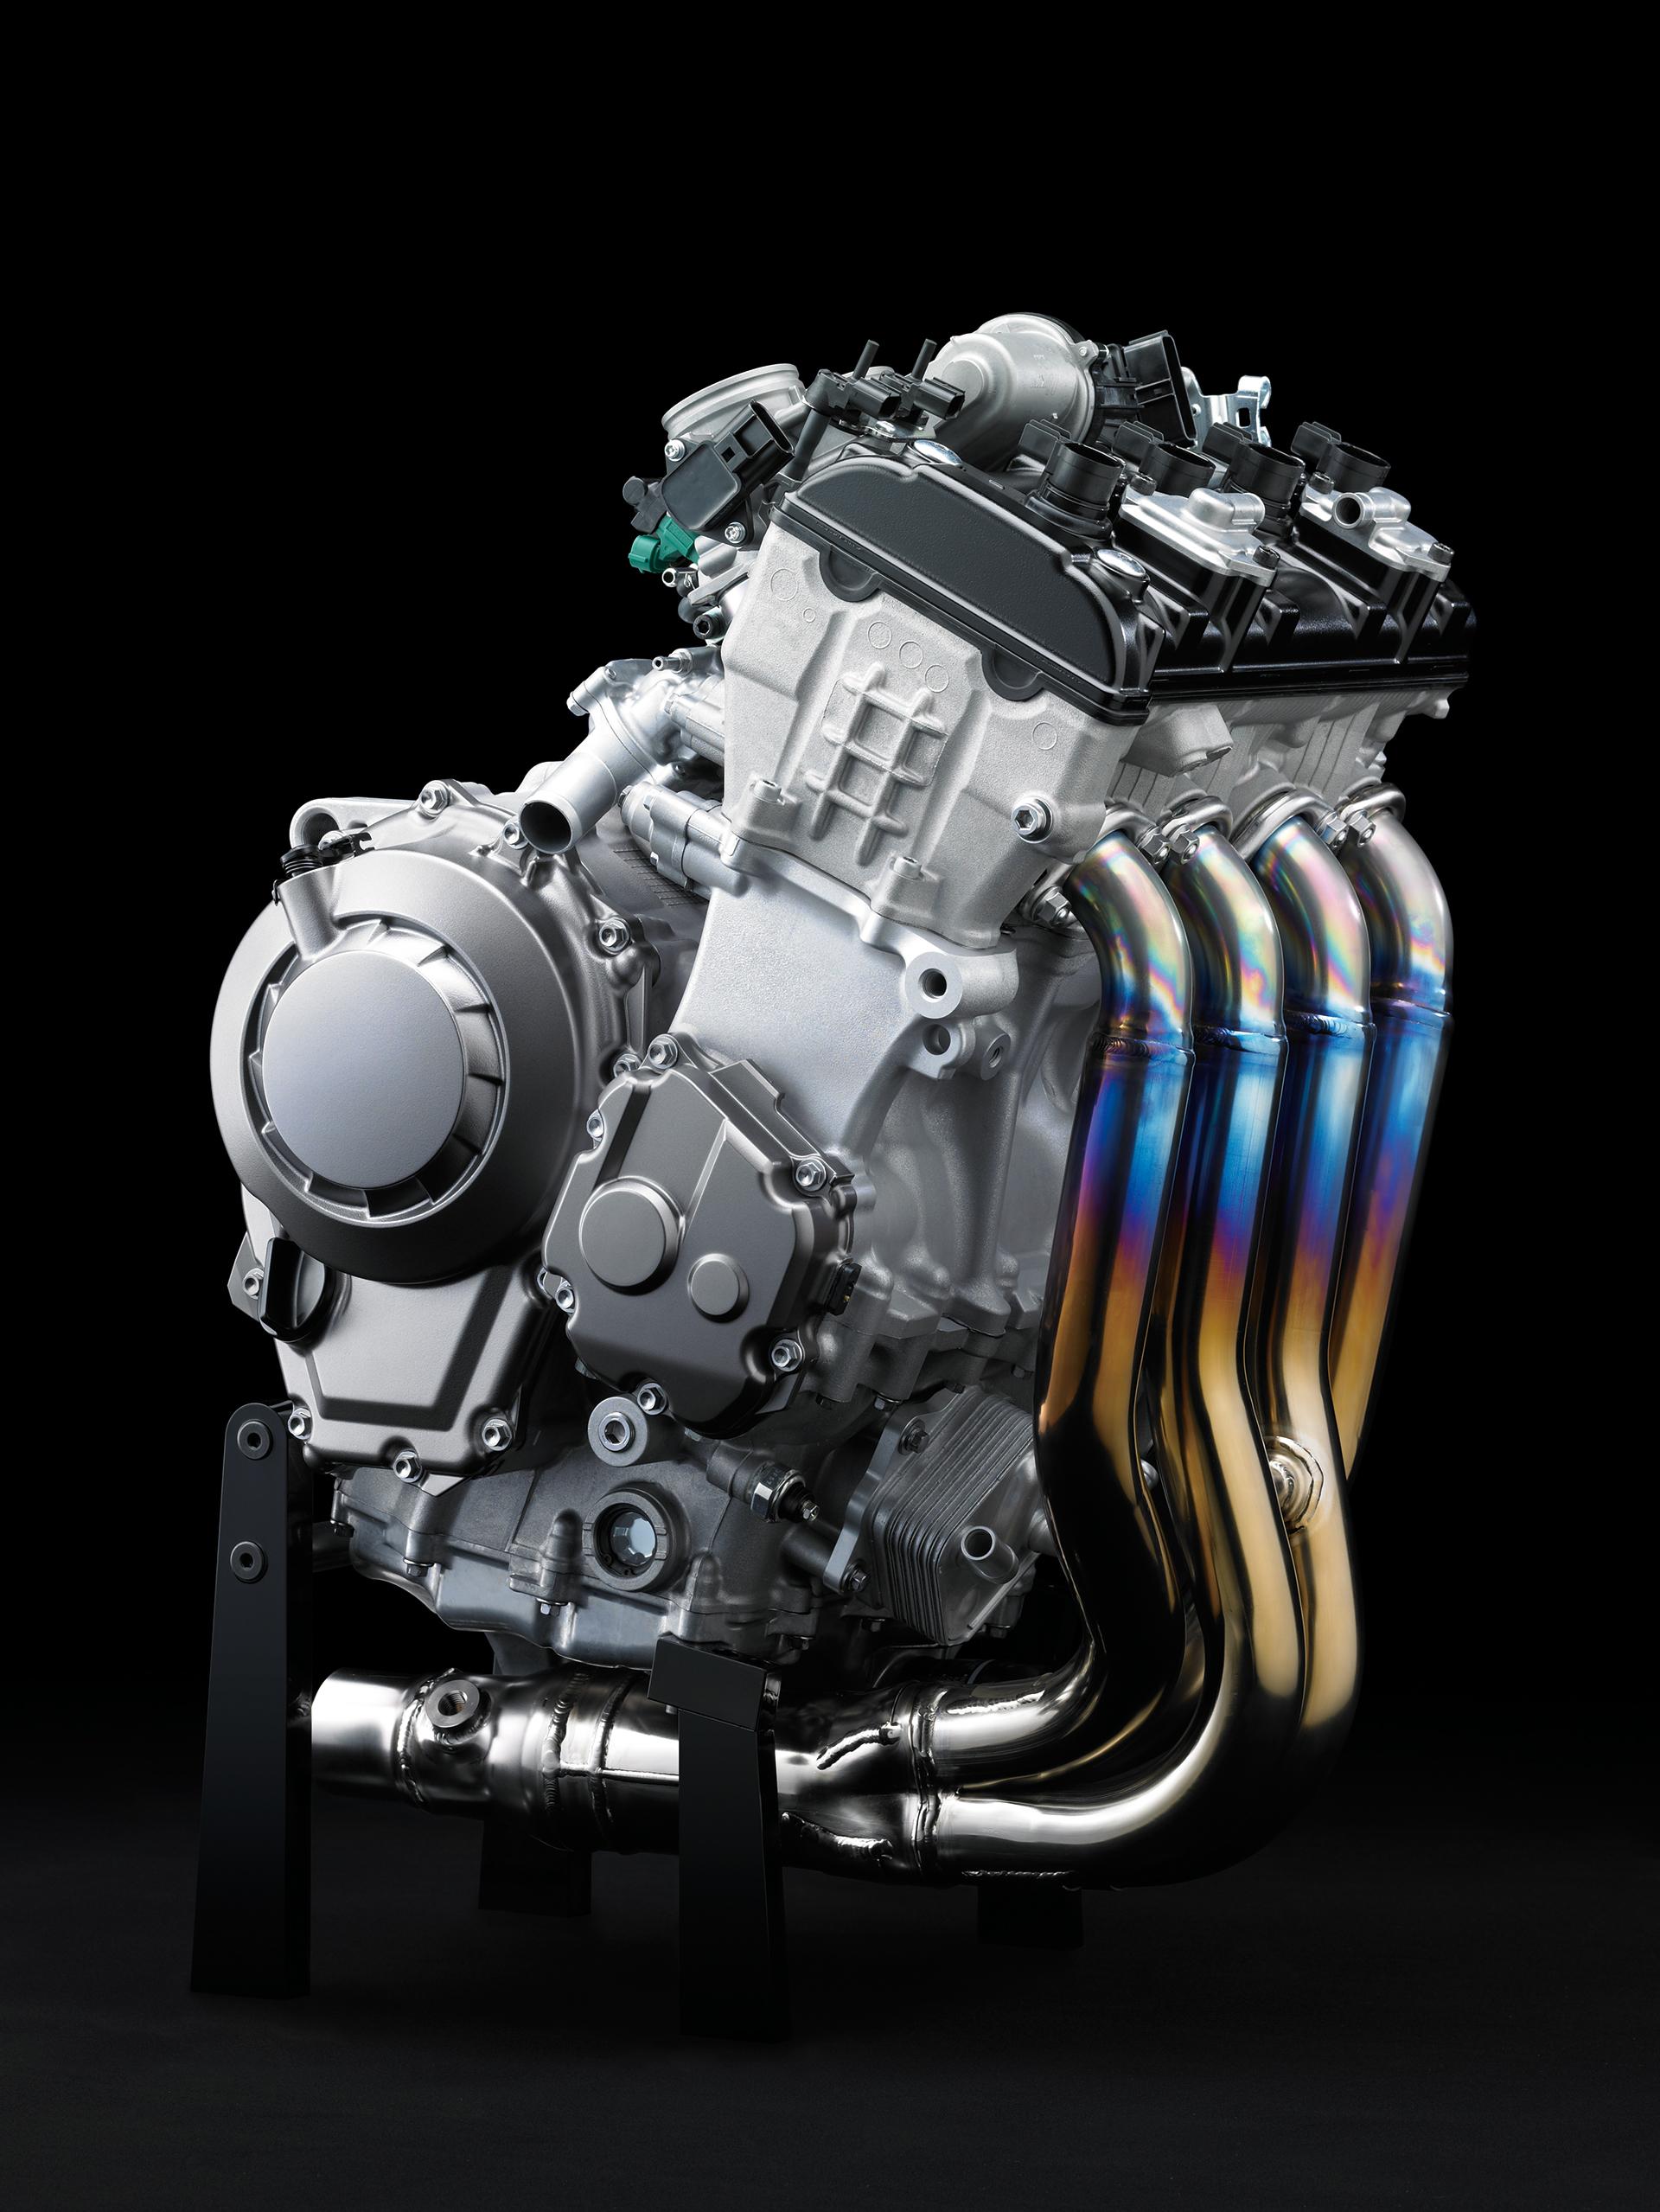 Kawasaki Ninja ZX-10R 2016 - moteur / engine